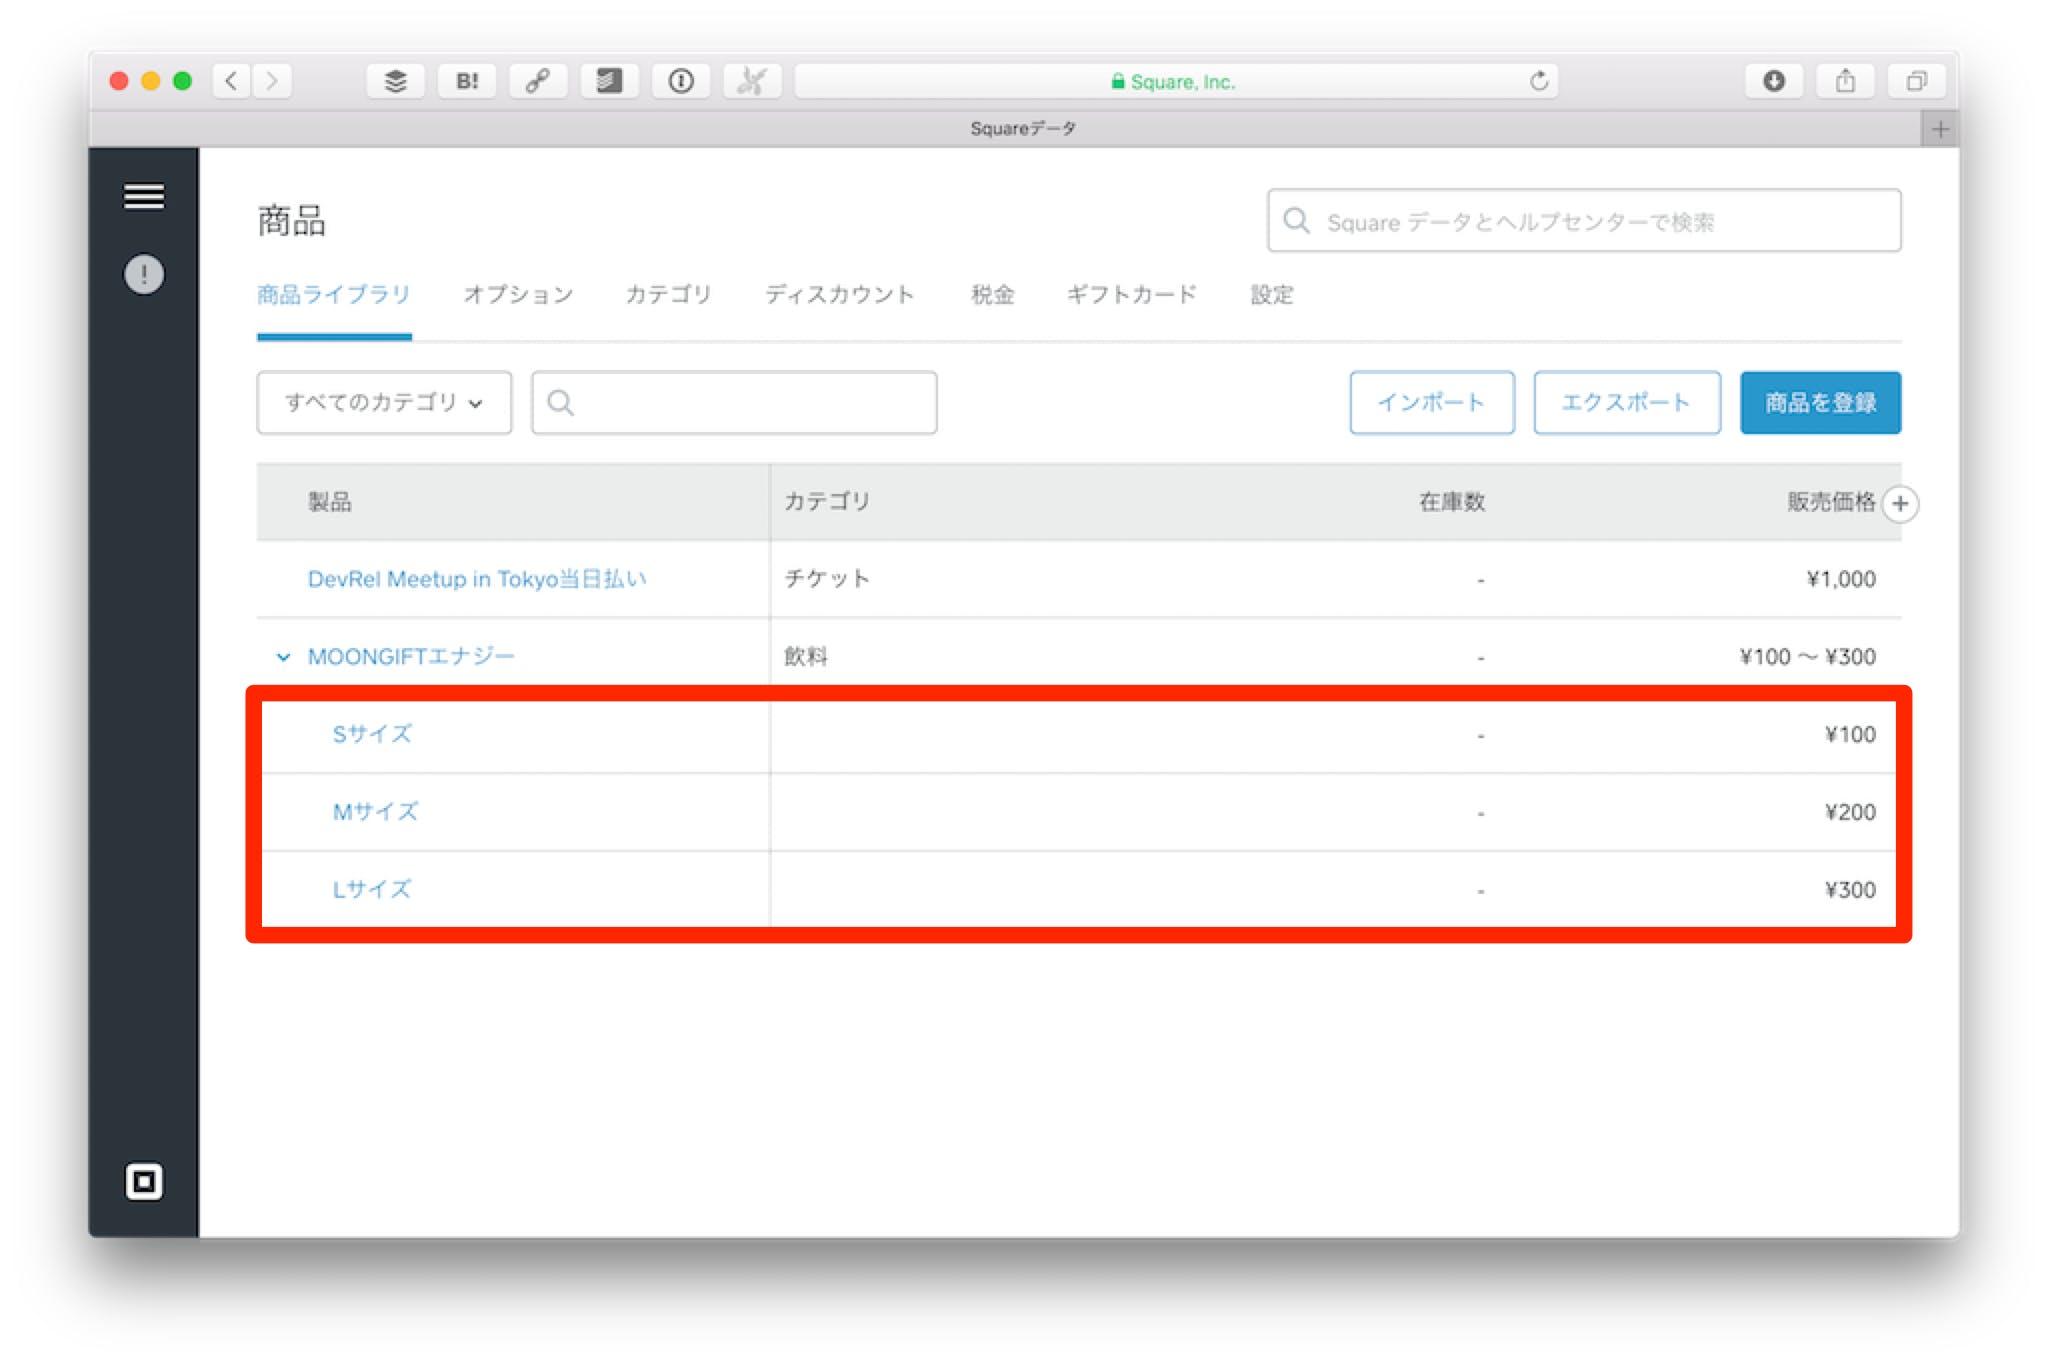 Screenshot_ 2017-11-25 11.07.06のコピー.png